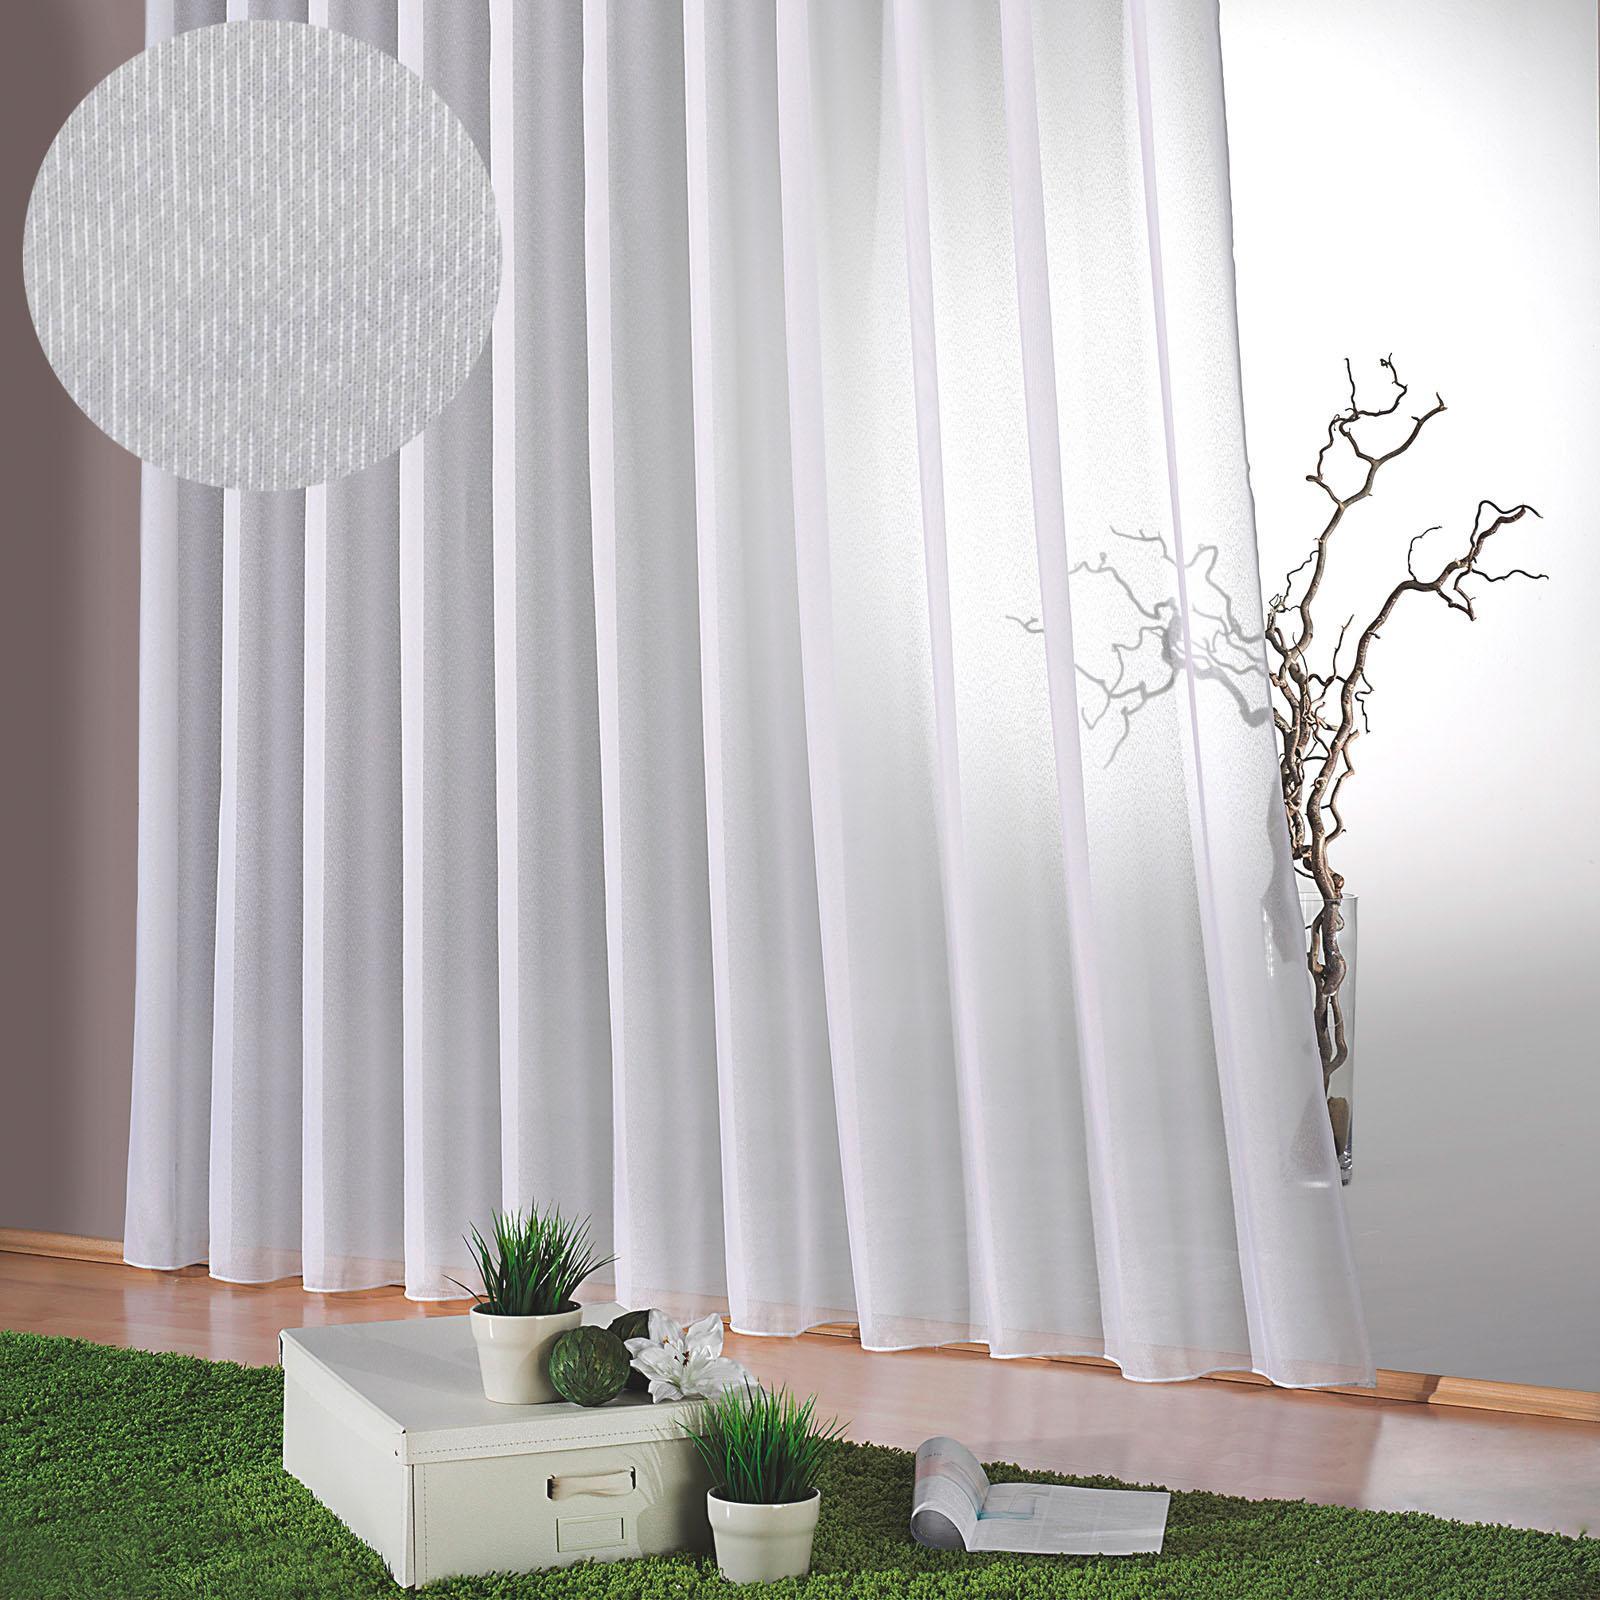 rabatt gardine lena weckbrodt gardinen faltenband 1 st ck. Black Bedroom Furniture Sets. Home Design Ideas